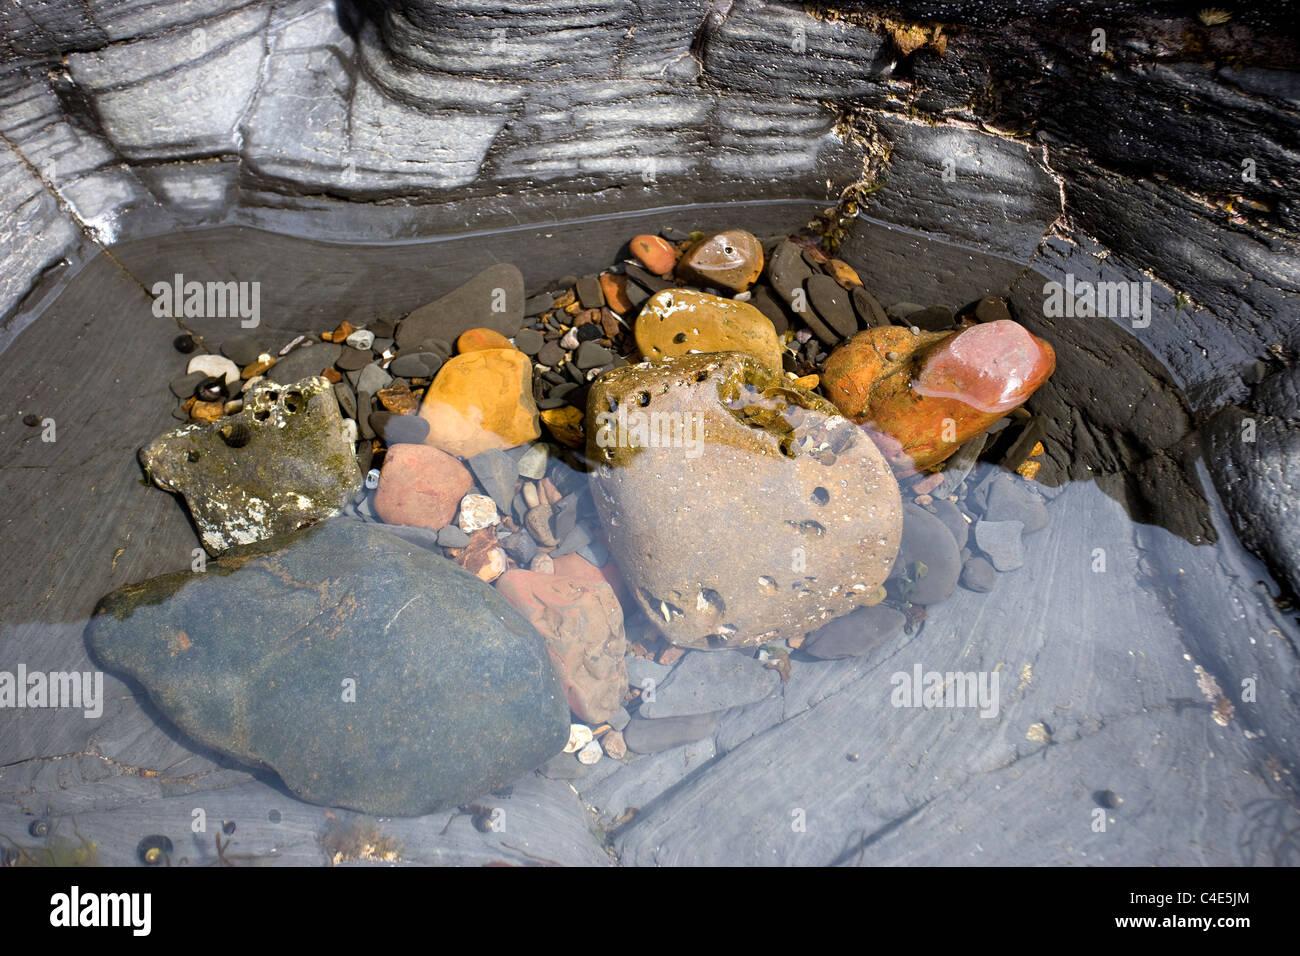 Piscine dans les rochers, Runswick Bay, East Coast Yorkshire, Angleterre Photo Stock